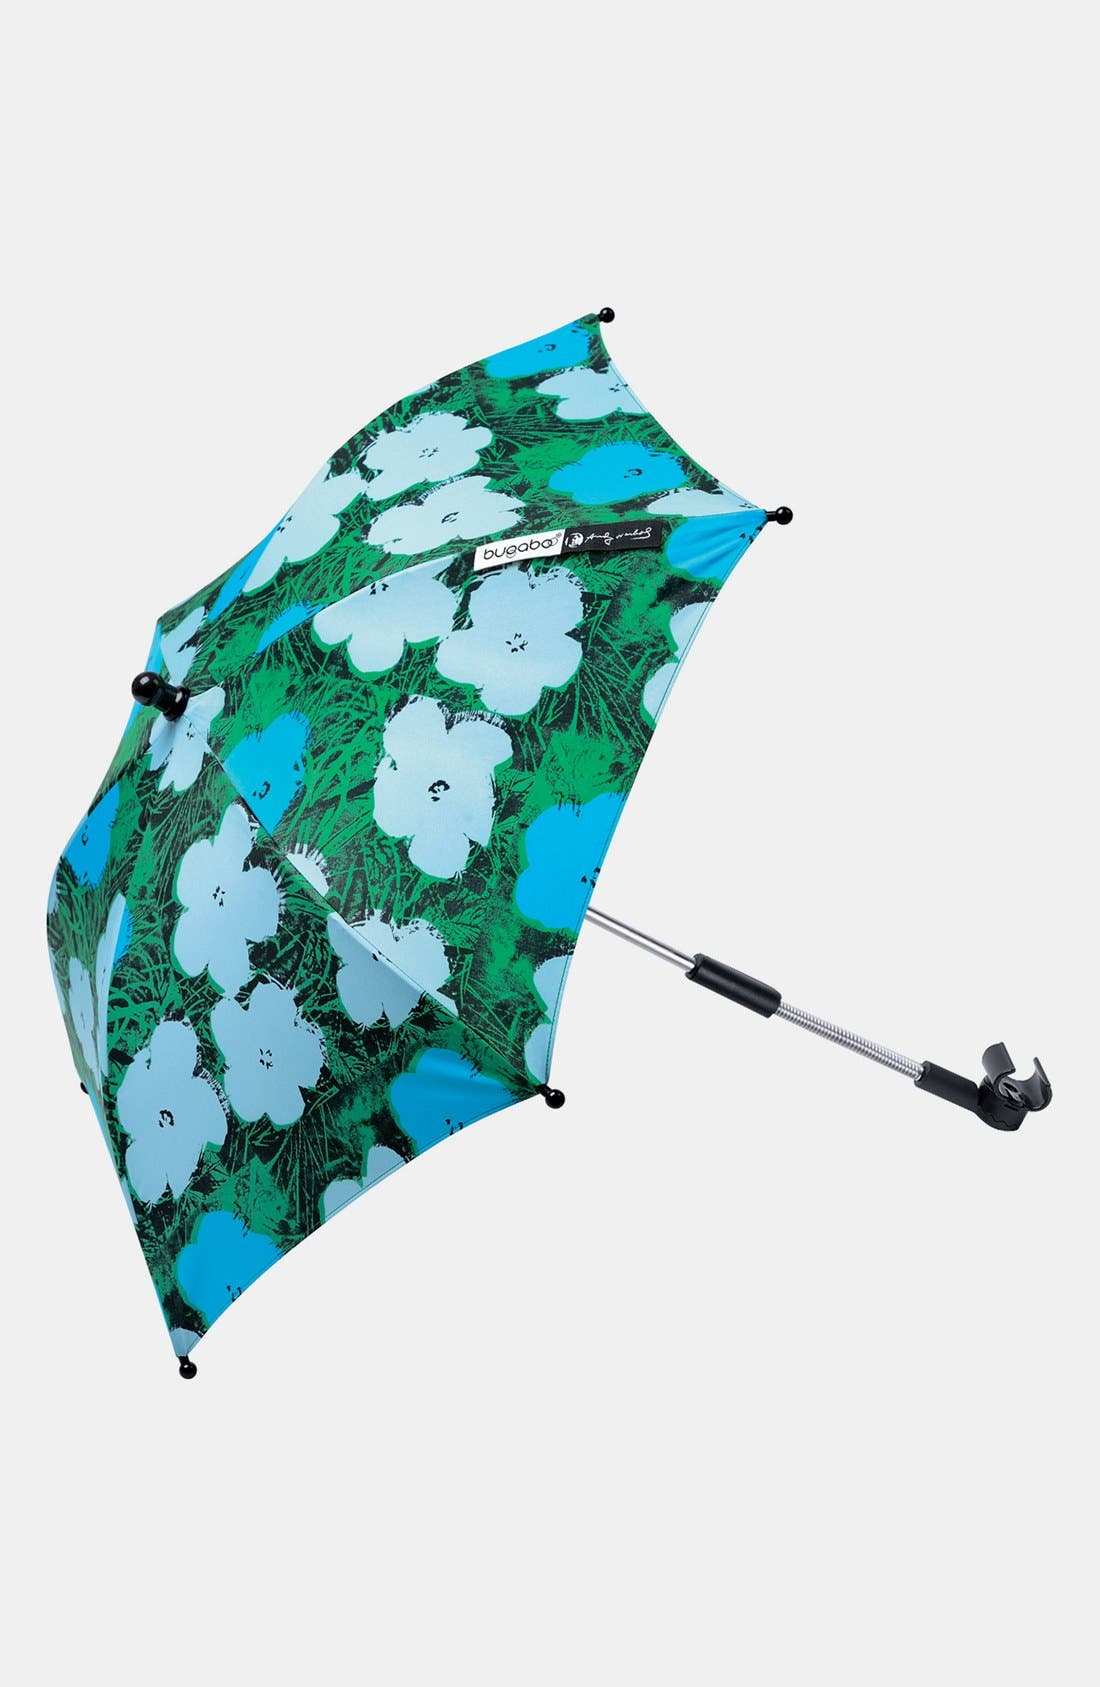 Alternate Image 1 Selected - Bugaboo 'Andy Warhol' Universal Stroller Parasol